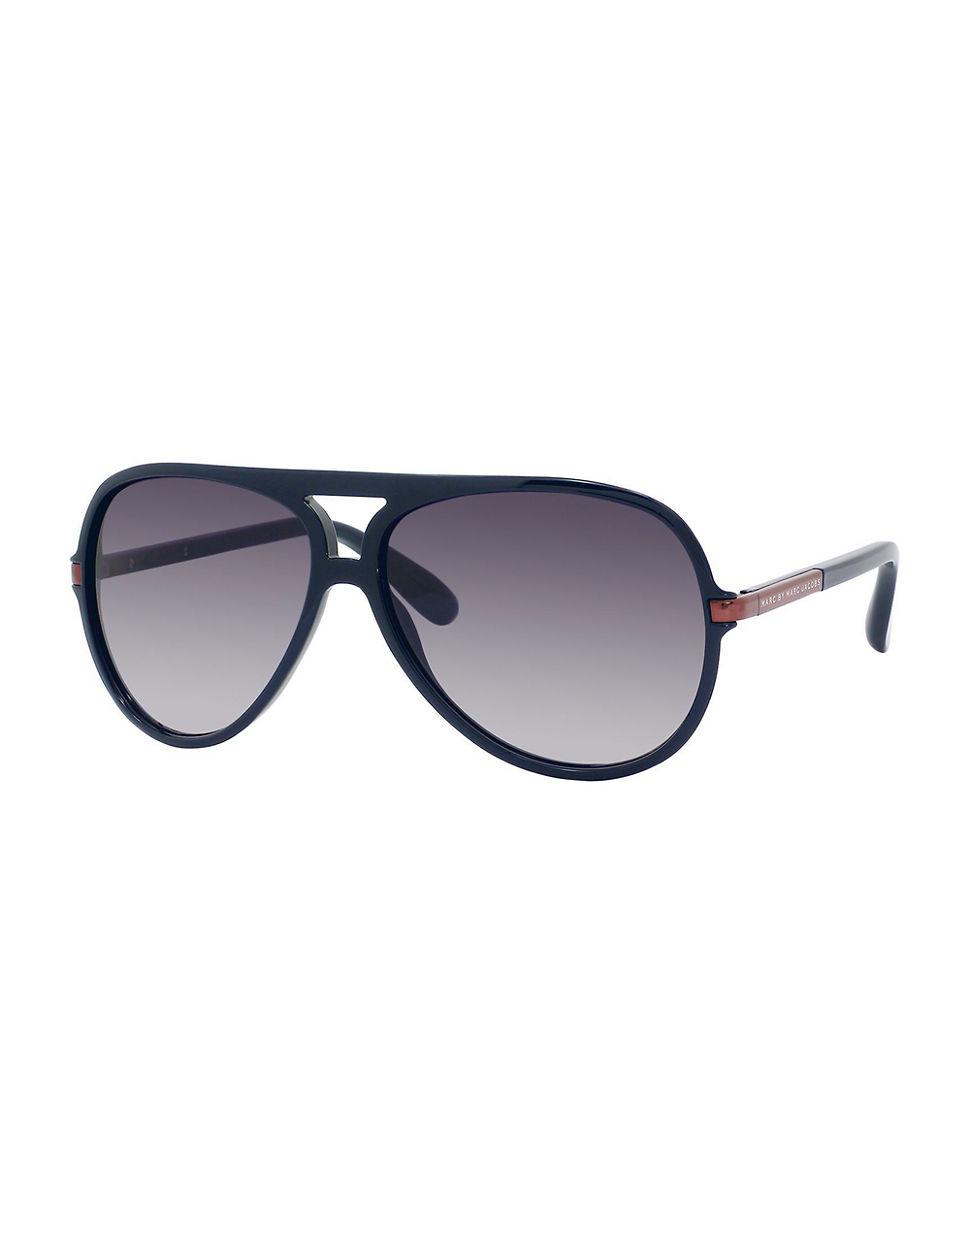 marc jacobs folding aviator sunglasses. Black Bedroom Furniture Sets. Home Design Ideas